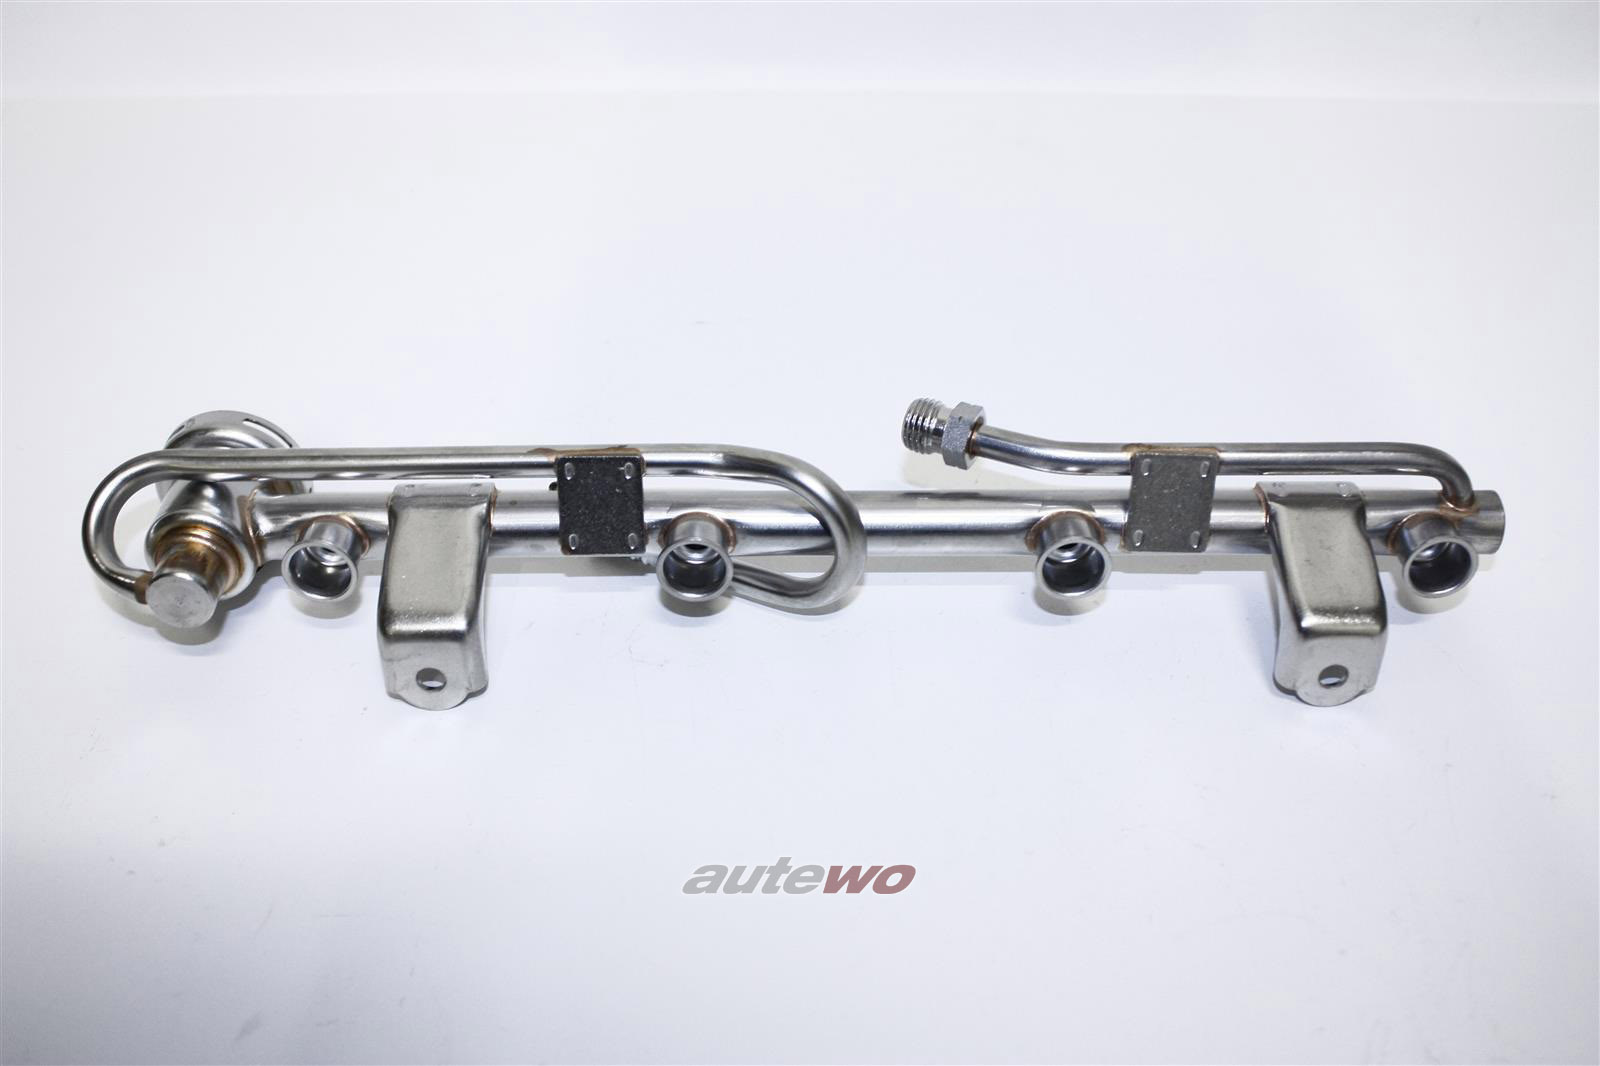 058133681C NEU Audi/VW 80 89 Cabrio/A4 B5/A6 C4/4B 1.8l-4.2l Einspritzleiste